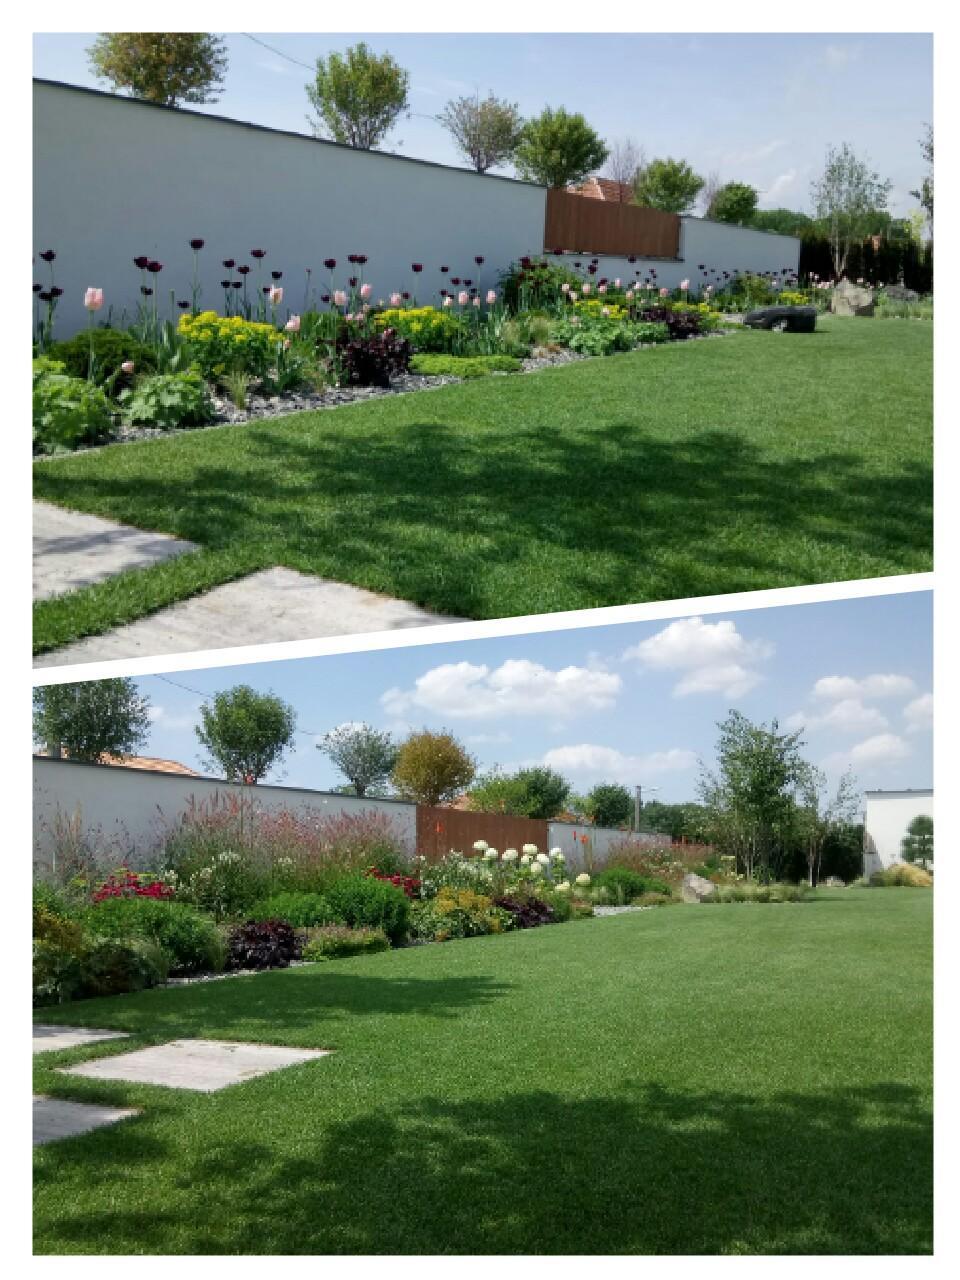 Zahrada 2017 - April verzus jul